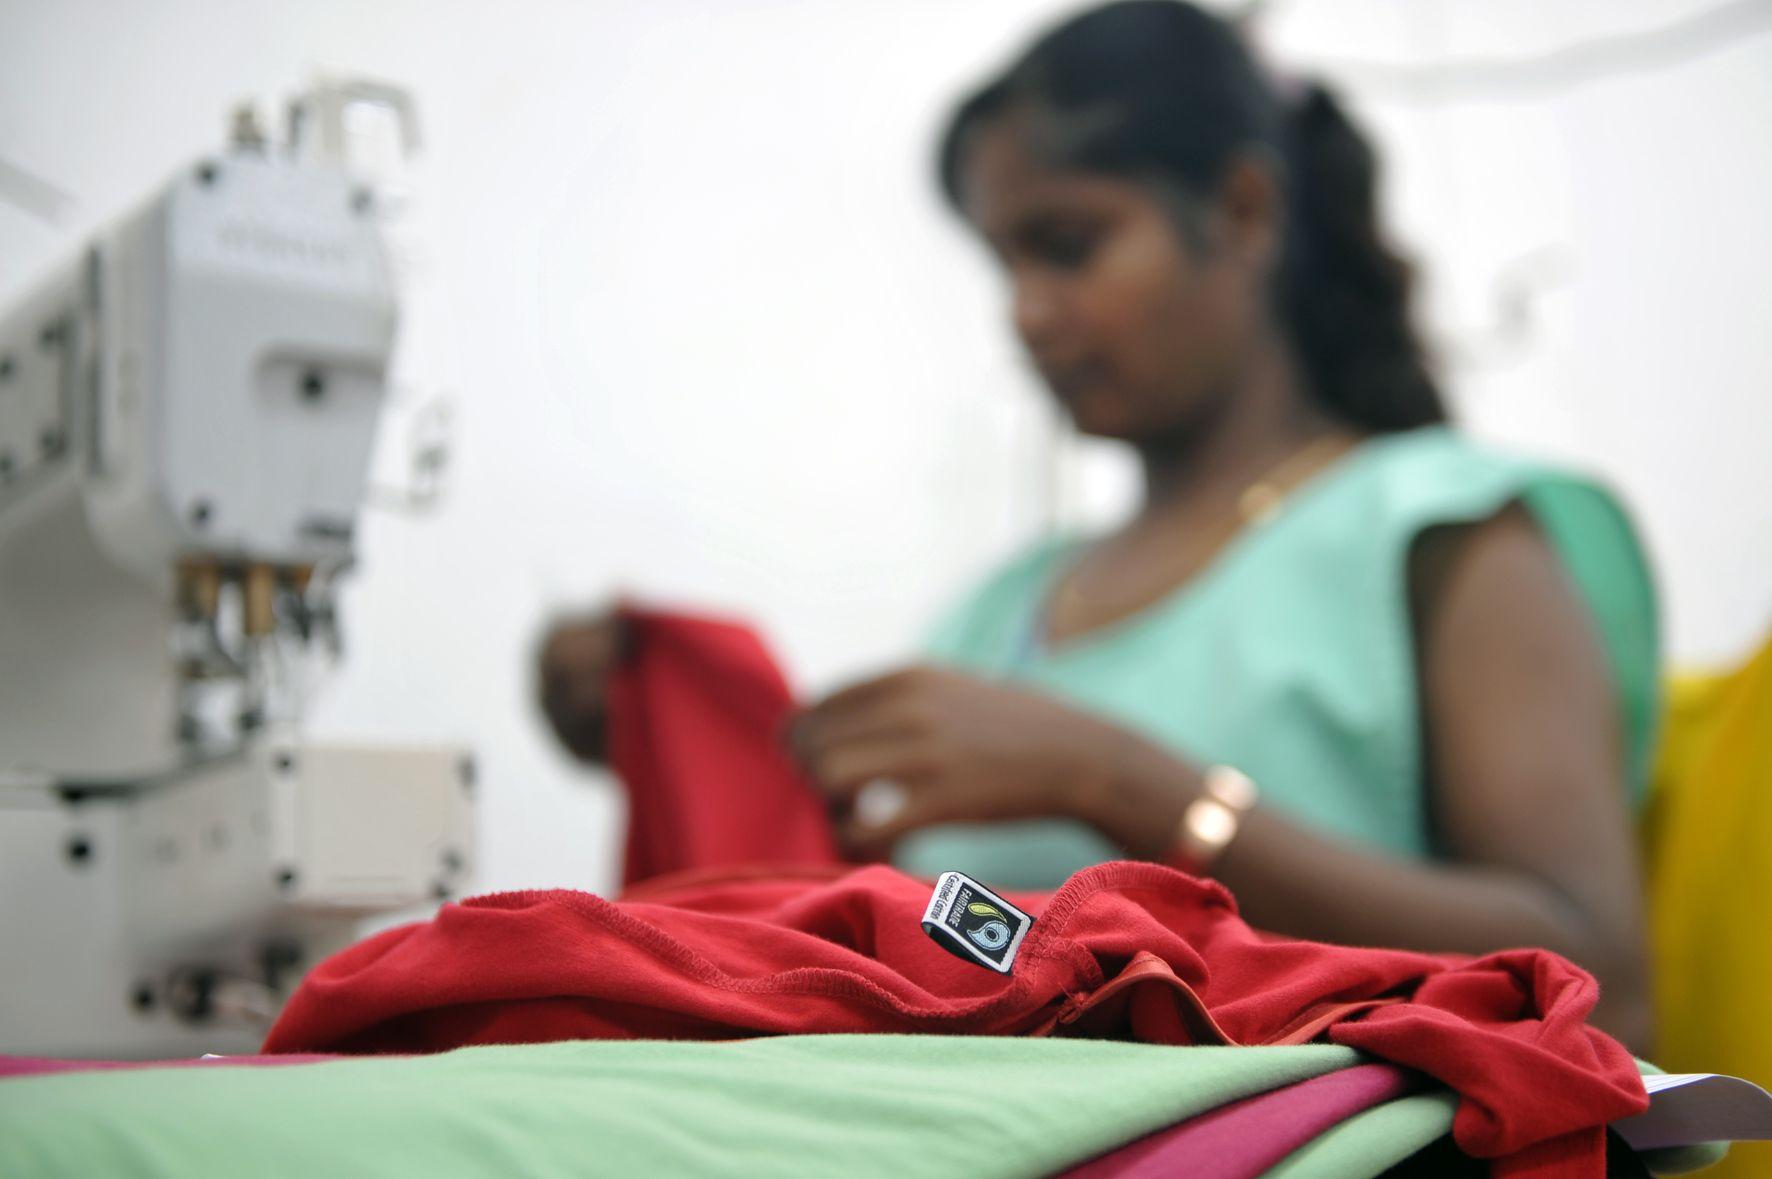 Fabryka Craft Adid Mauritius, ubranie z bawełny Fairtrade, fot. Manfred Winner